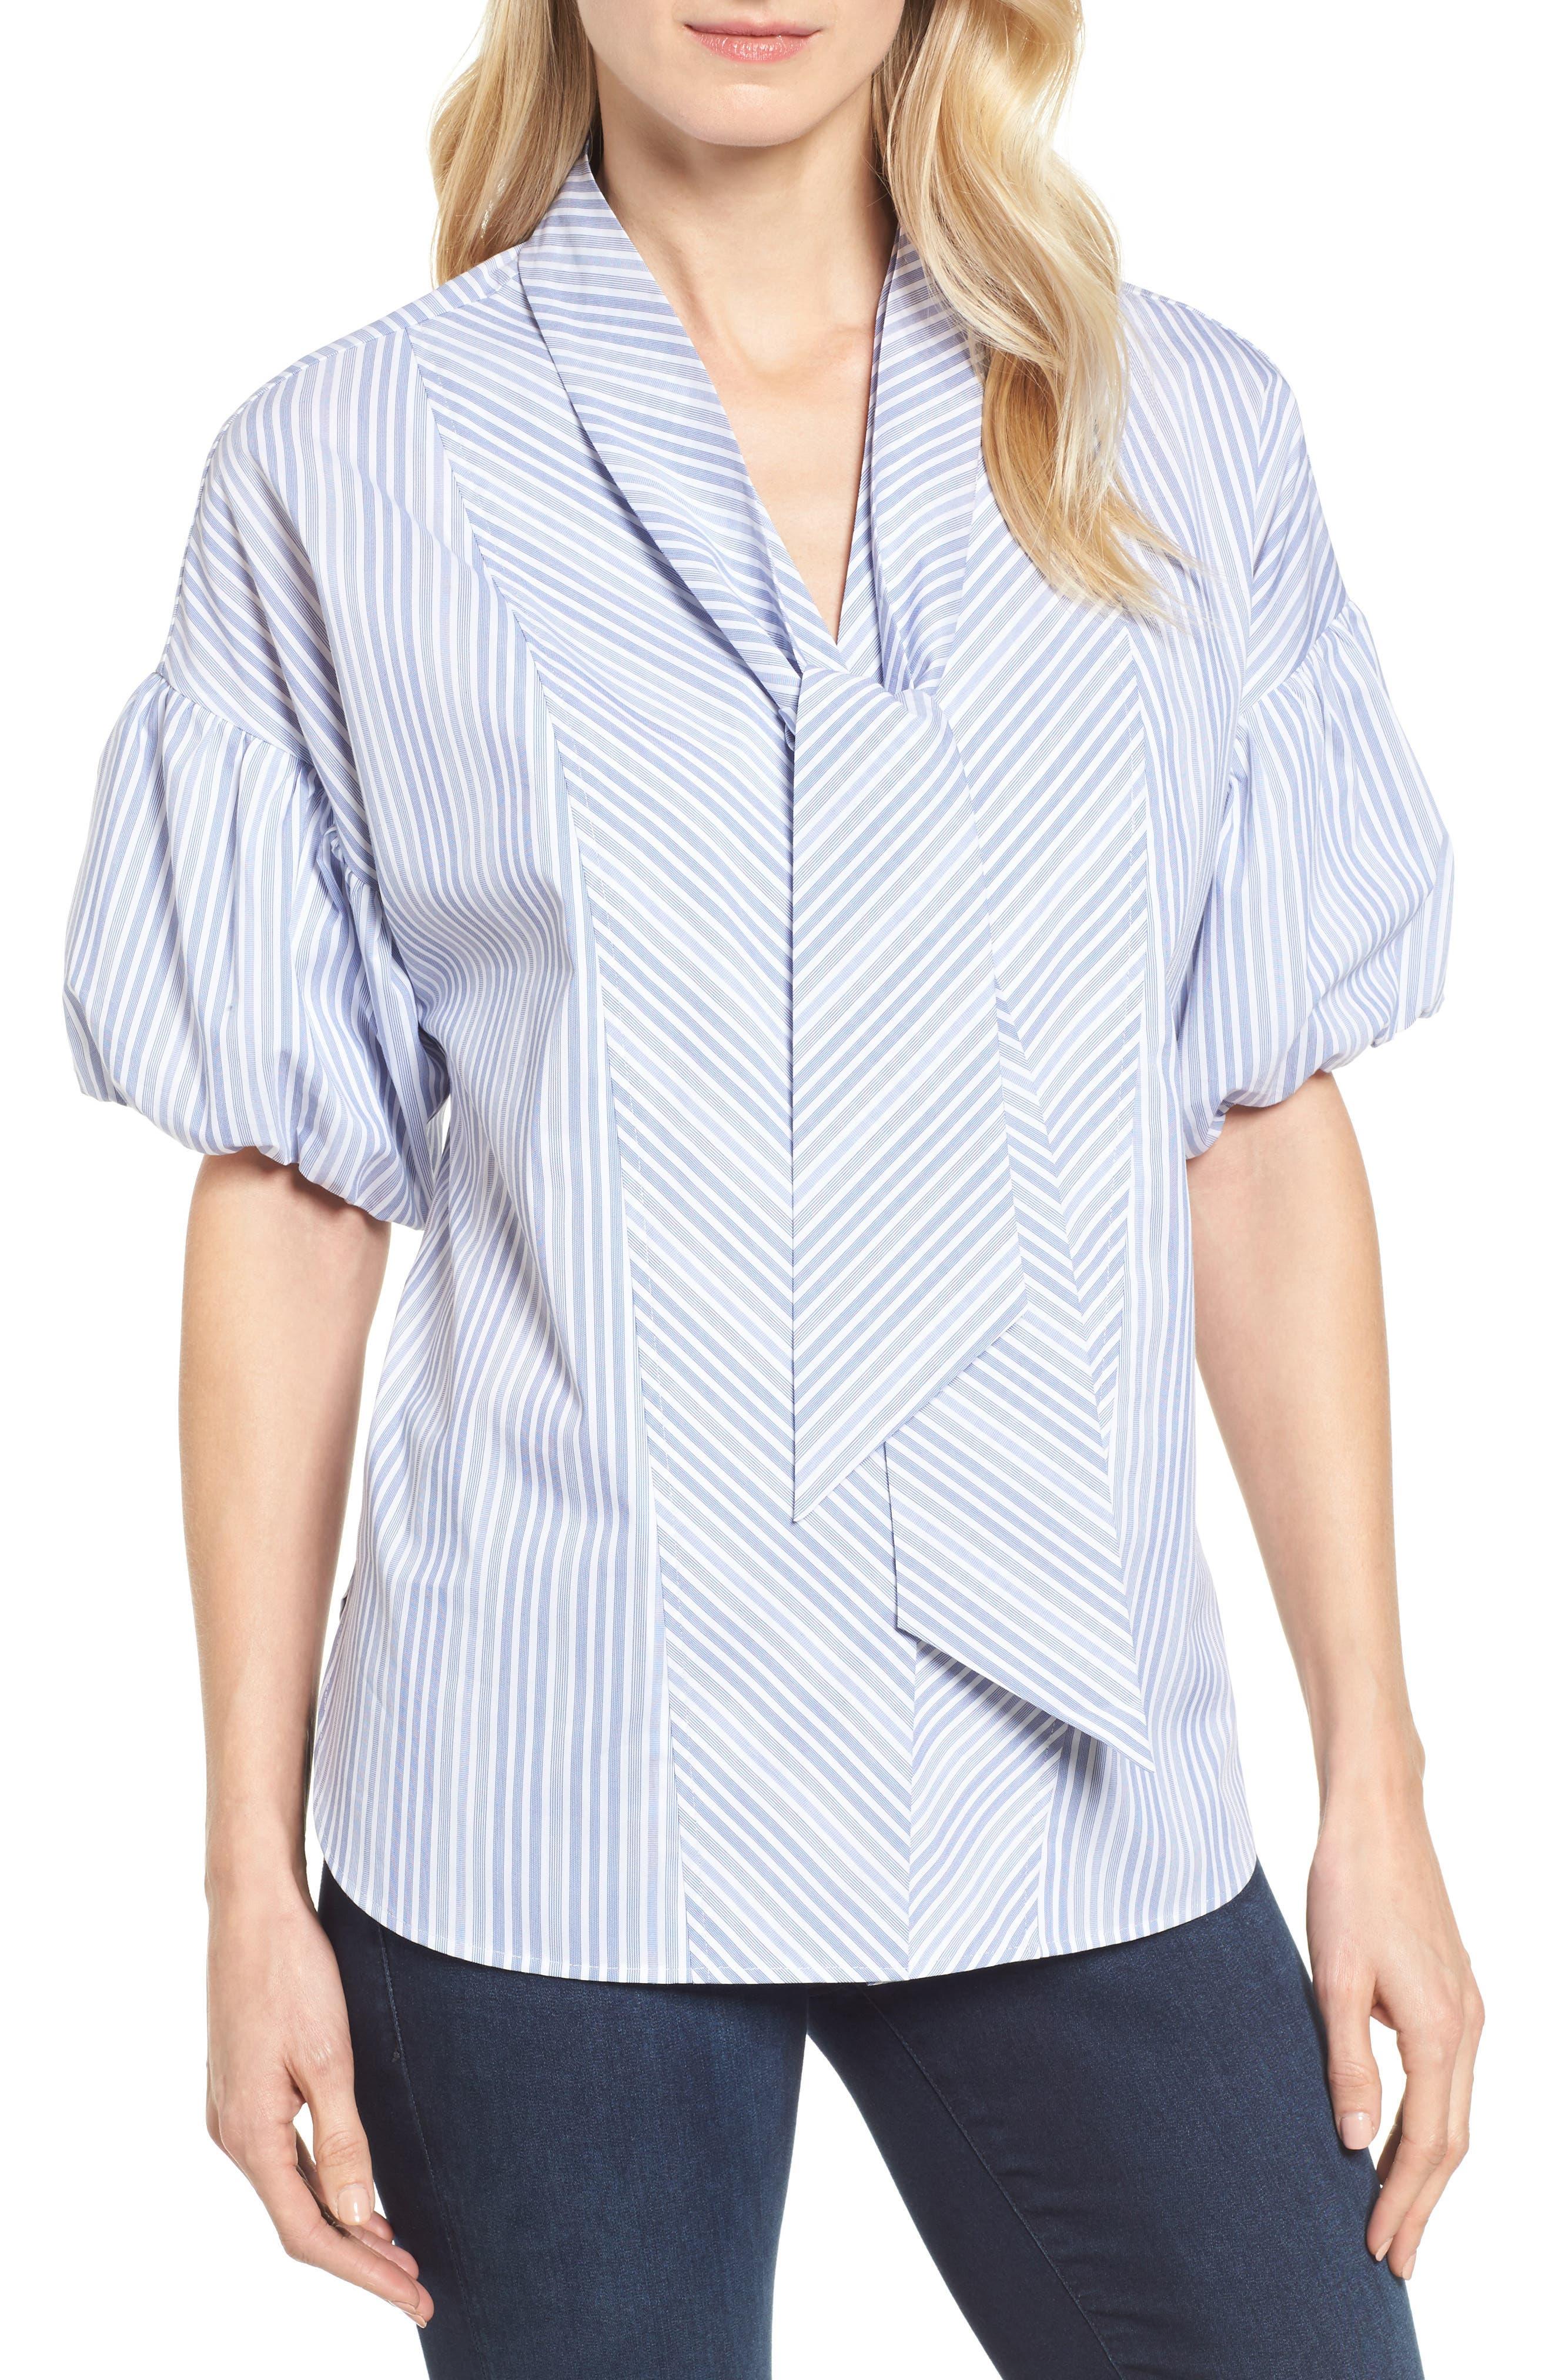 Tie Front Short Sleeve Blouse,                         Main,                         color, Blue- White Stripe